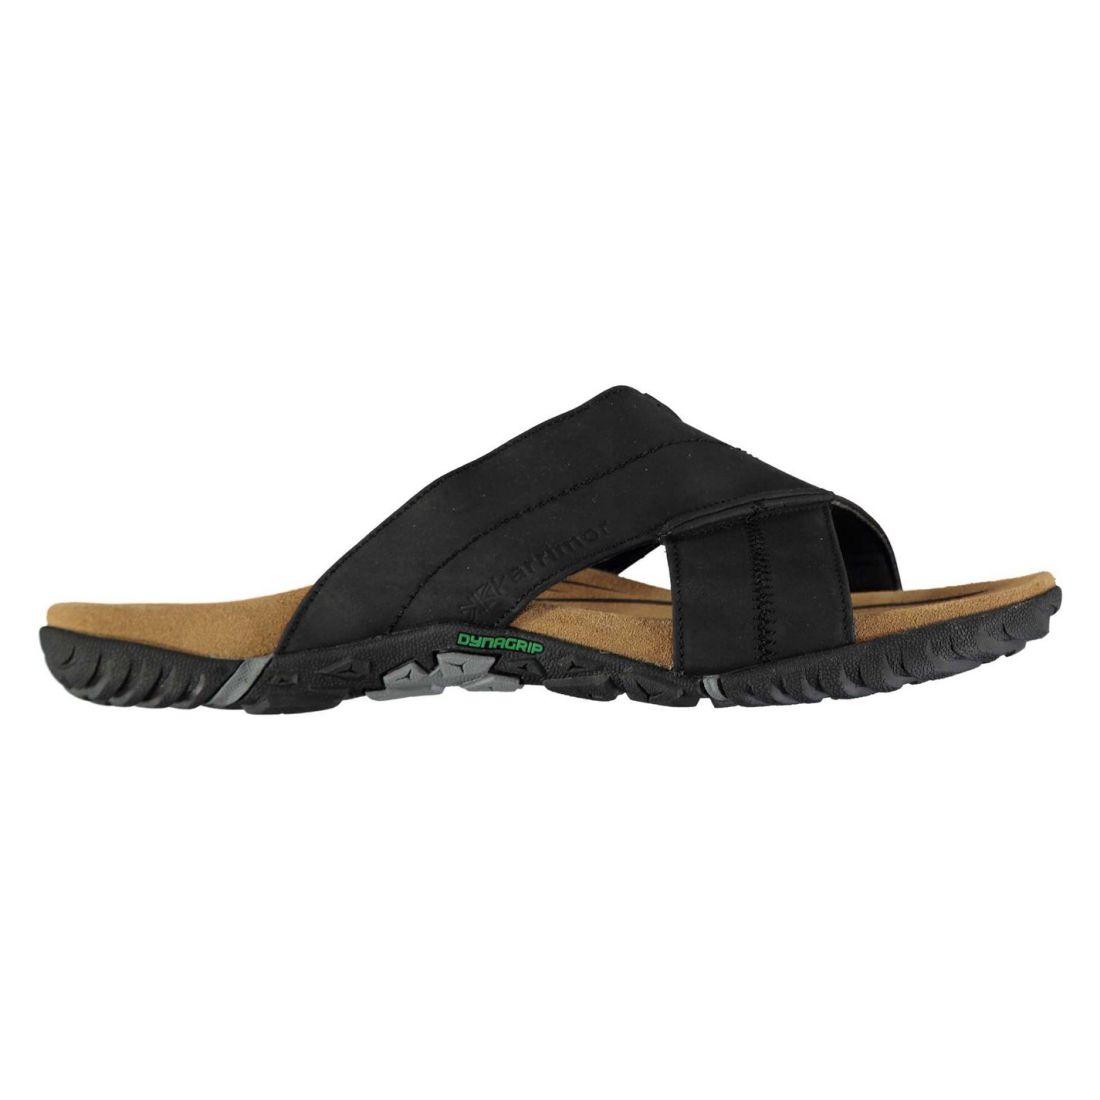 1cca84d225802c Karrimor Mens Lounge Slide Sandals Strap Leather Slipper Mules Flip ...